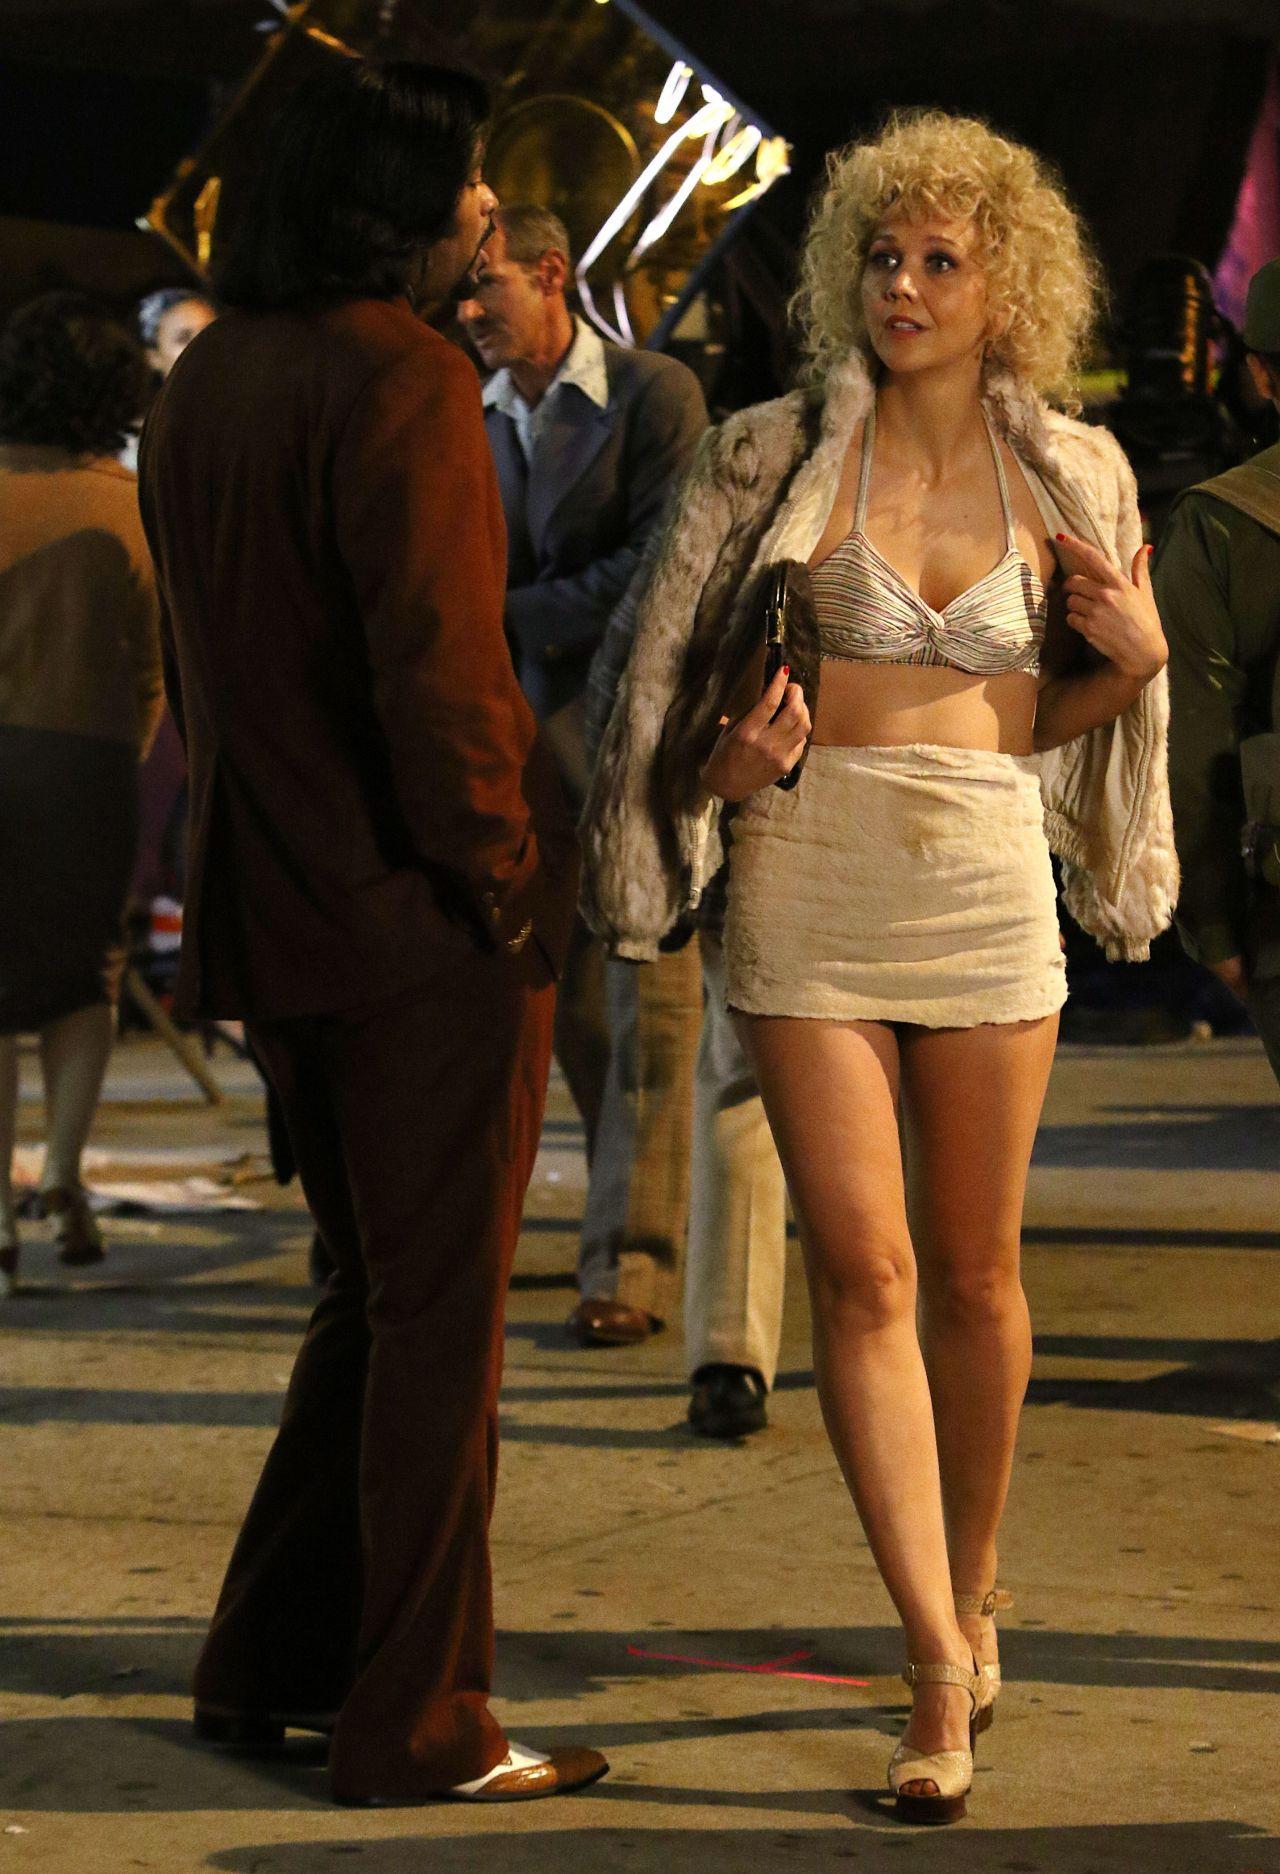 Maggie Gyllenhaal On The Set Of The Deuce In New York